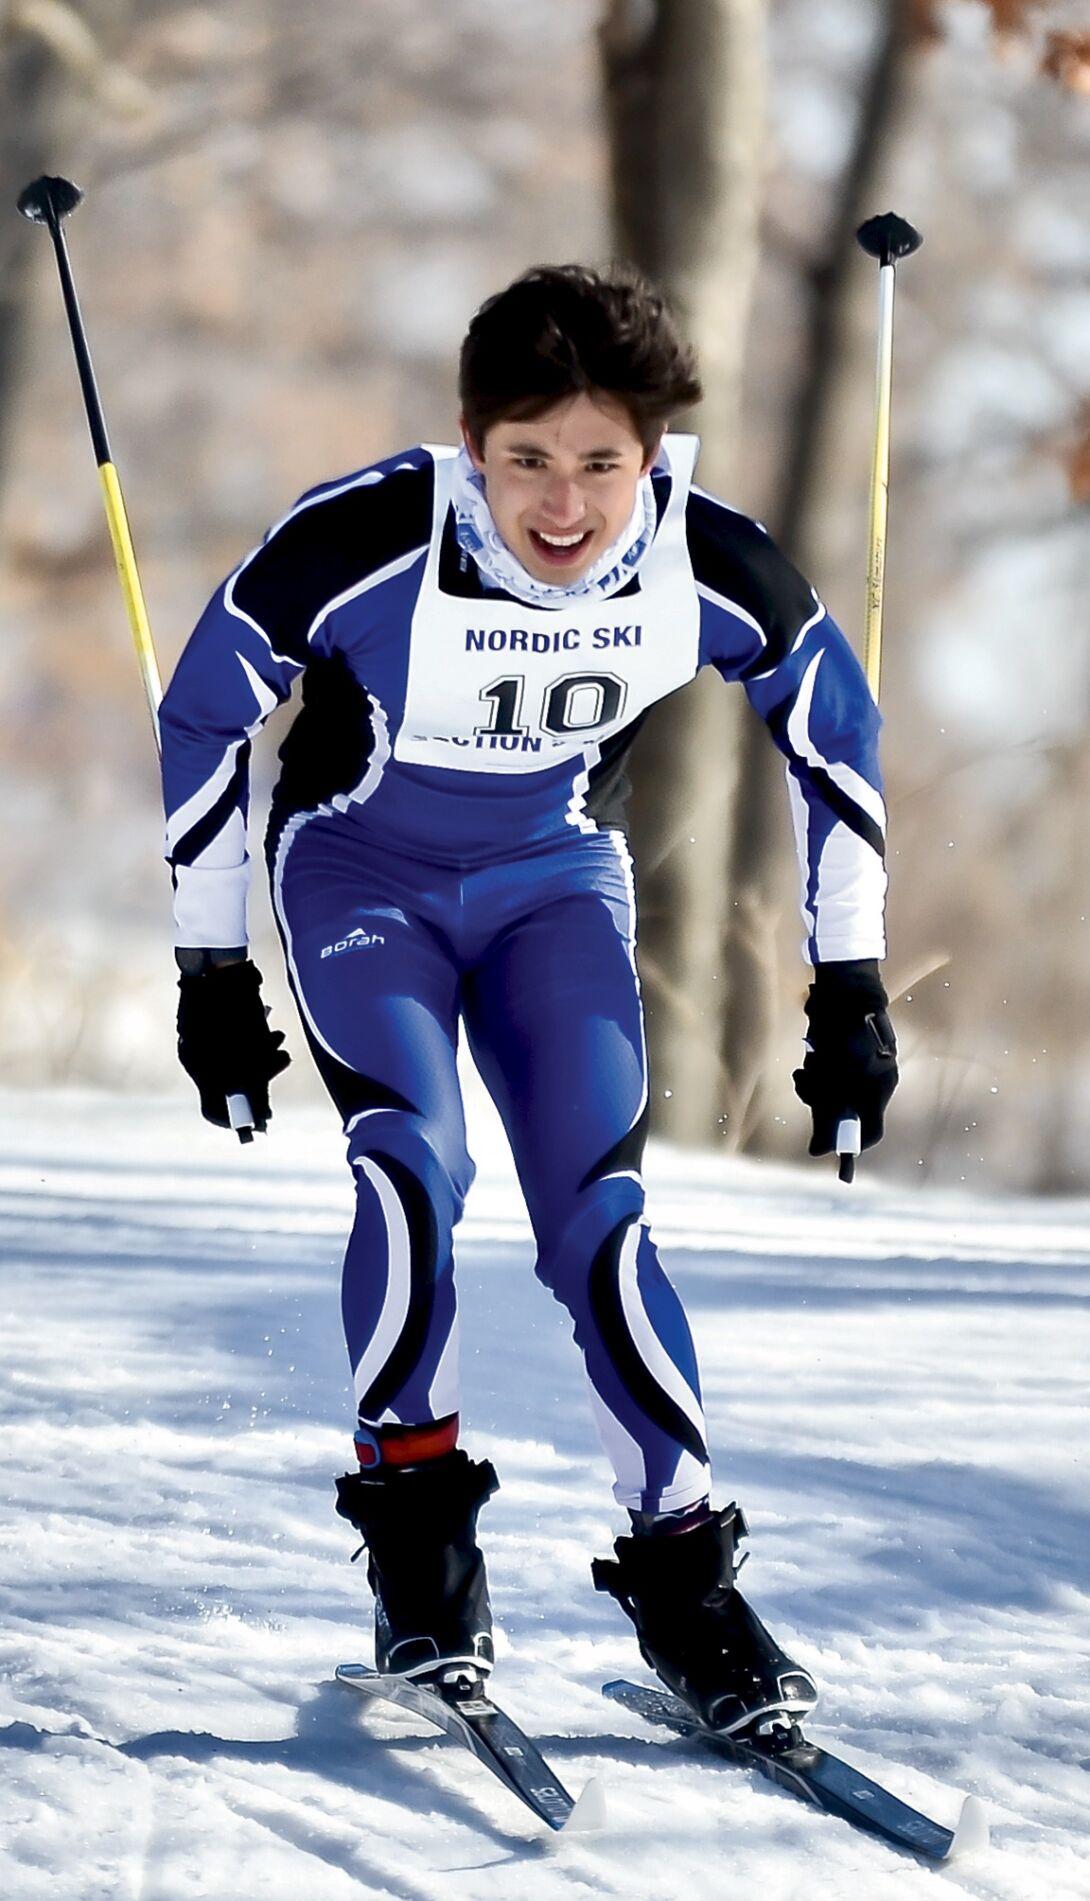 rogers spt Nordic boys oconnor